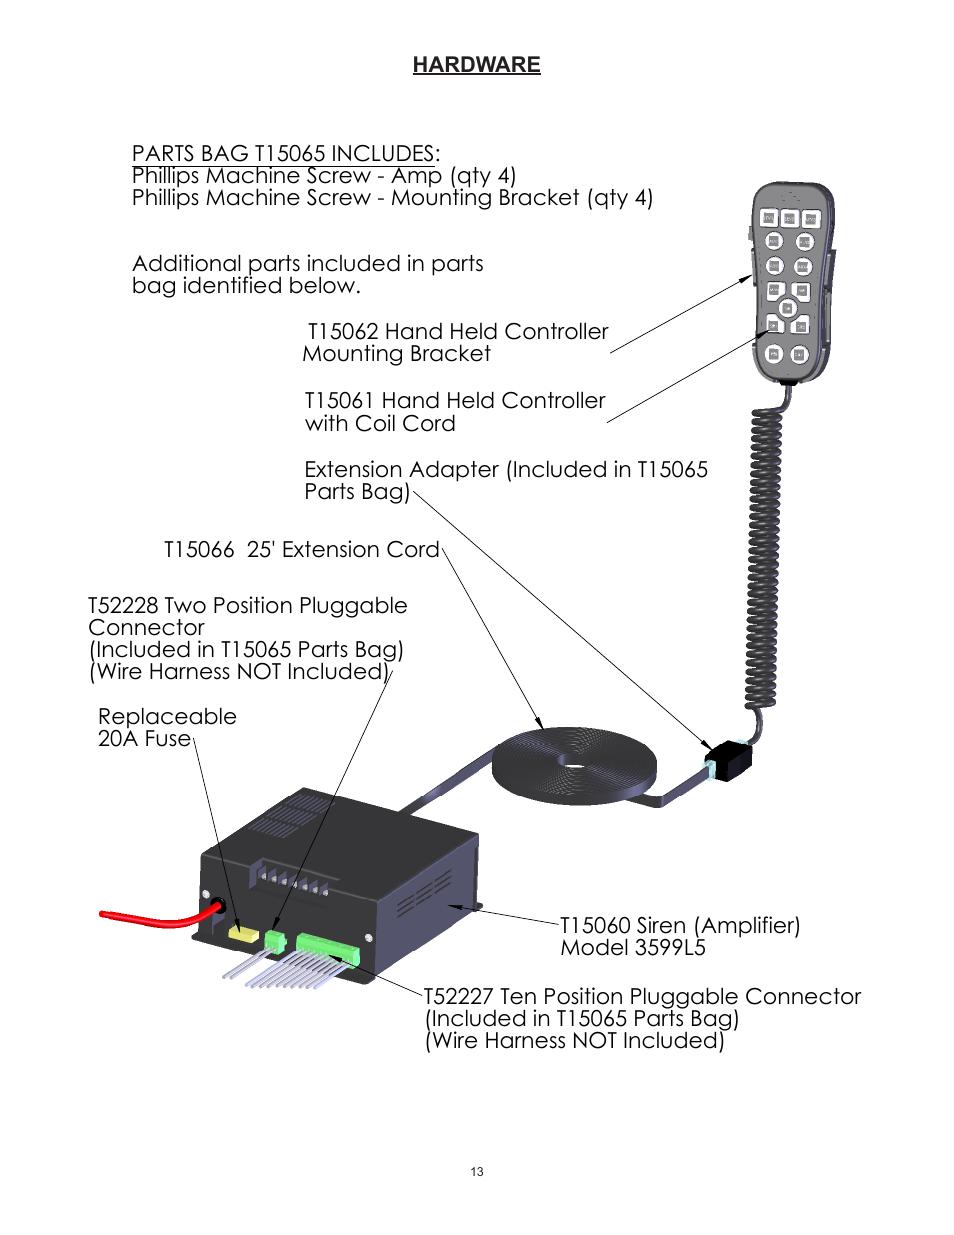 Code 3 Siren Control Box Wiring Diagram - Wiring Diagram Federal Signal Pa Wiring Diagram on